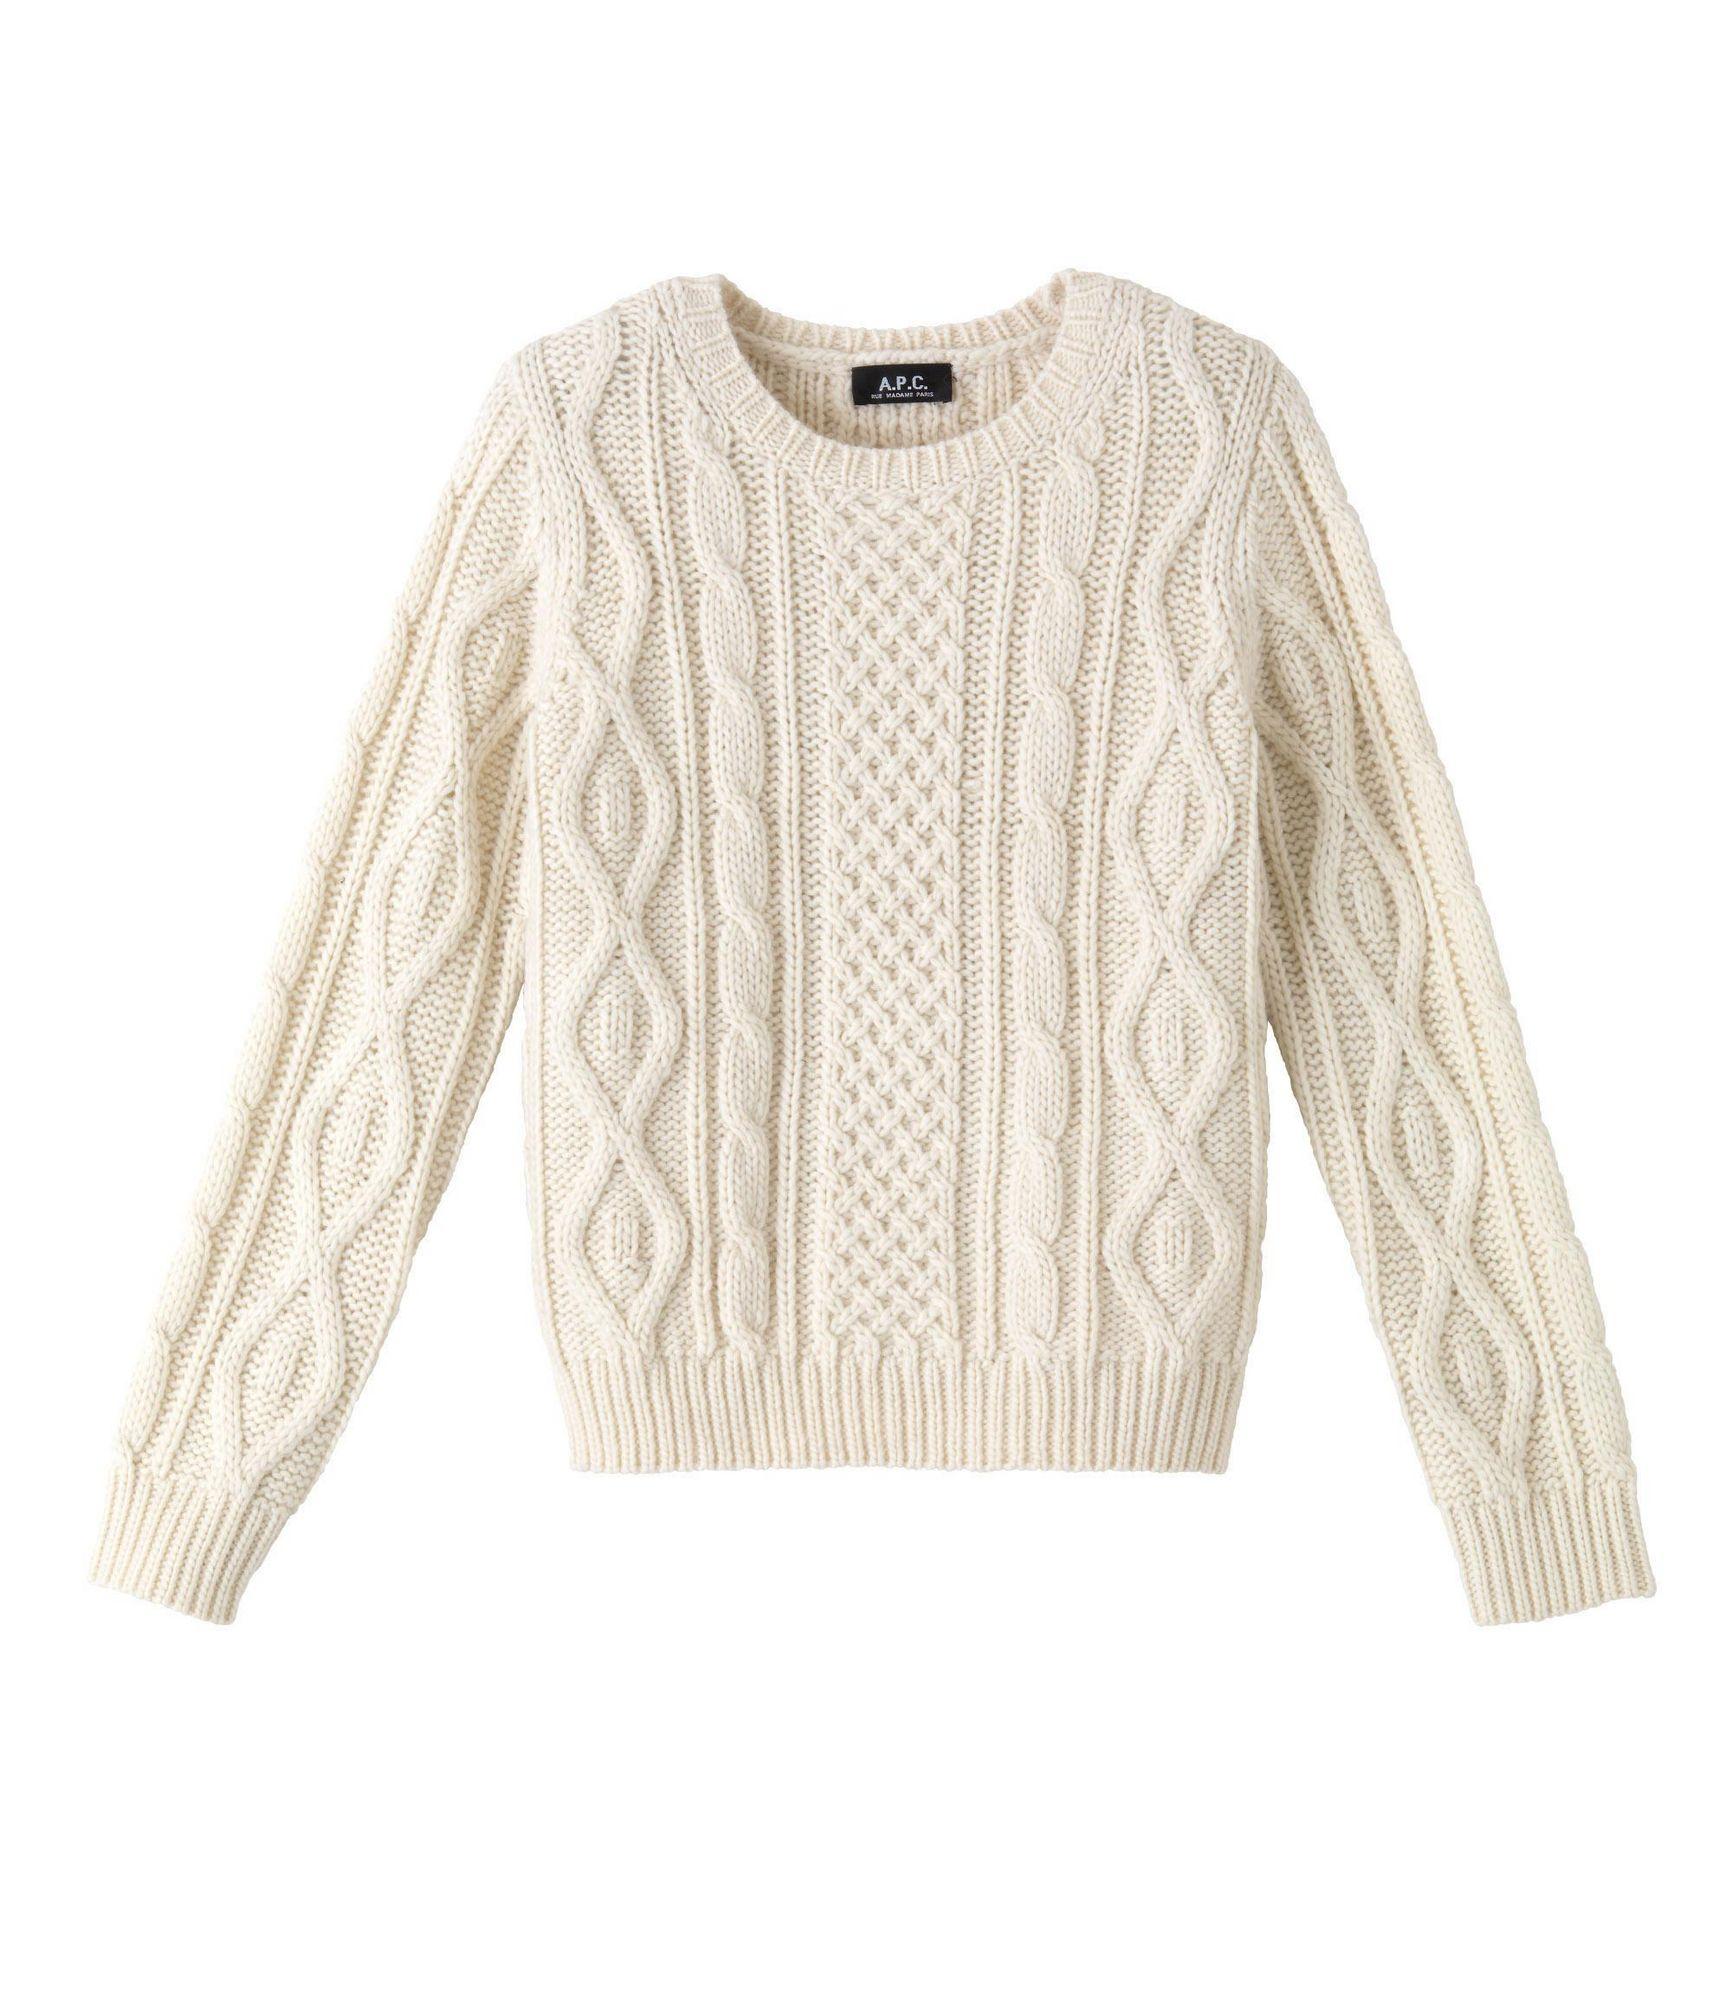 Irish pullover - Off white - A.P.C. WOMEN